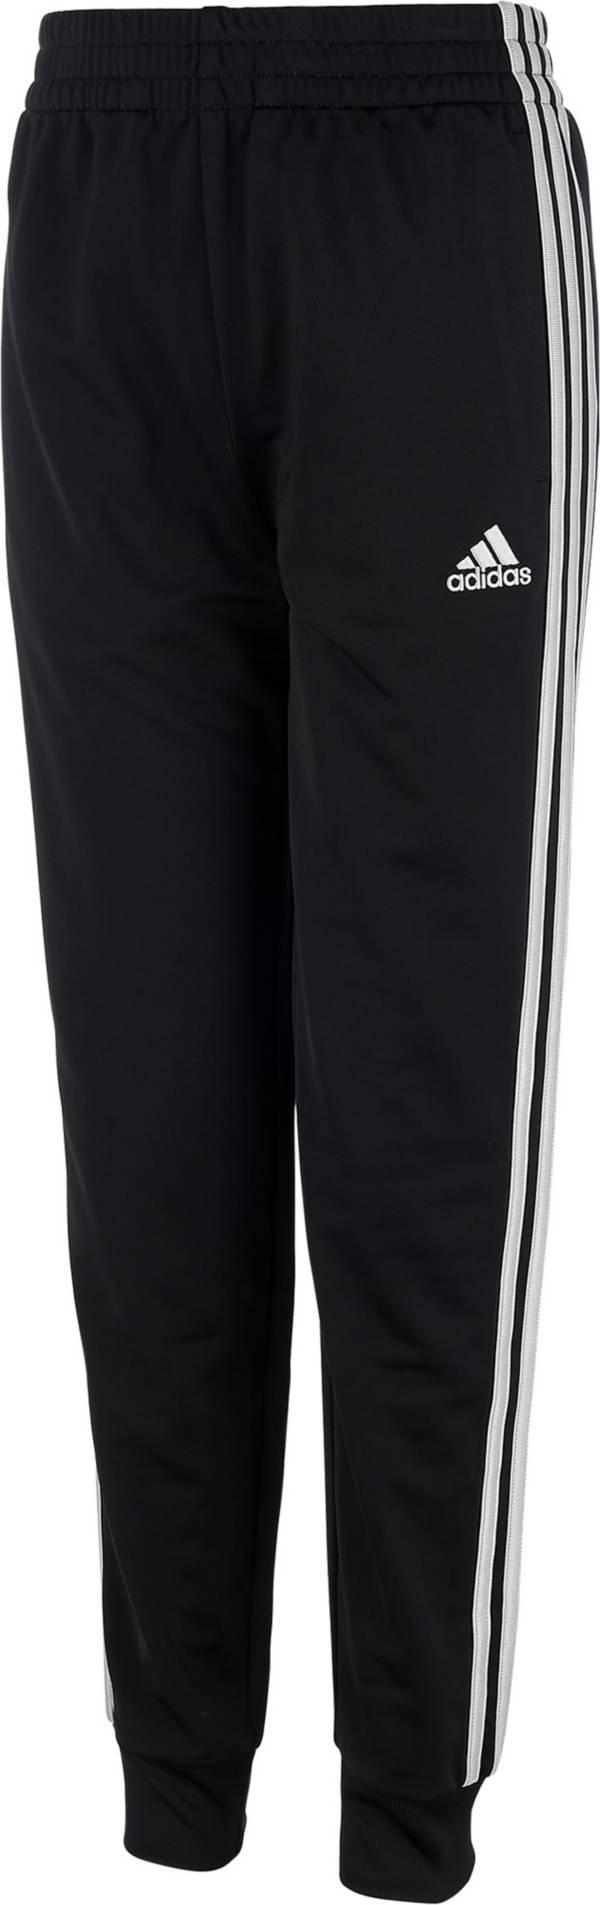 adidas Boys' Tricot Jogger Pants product image